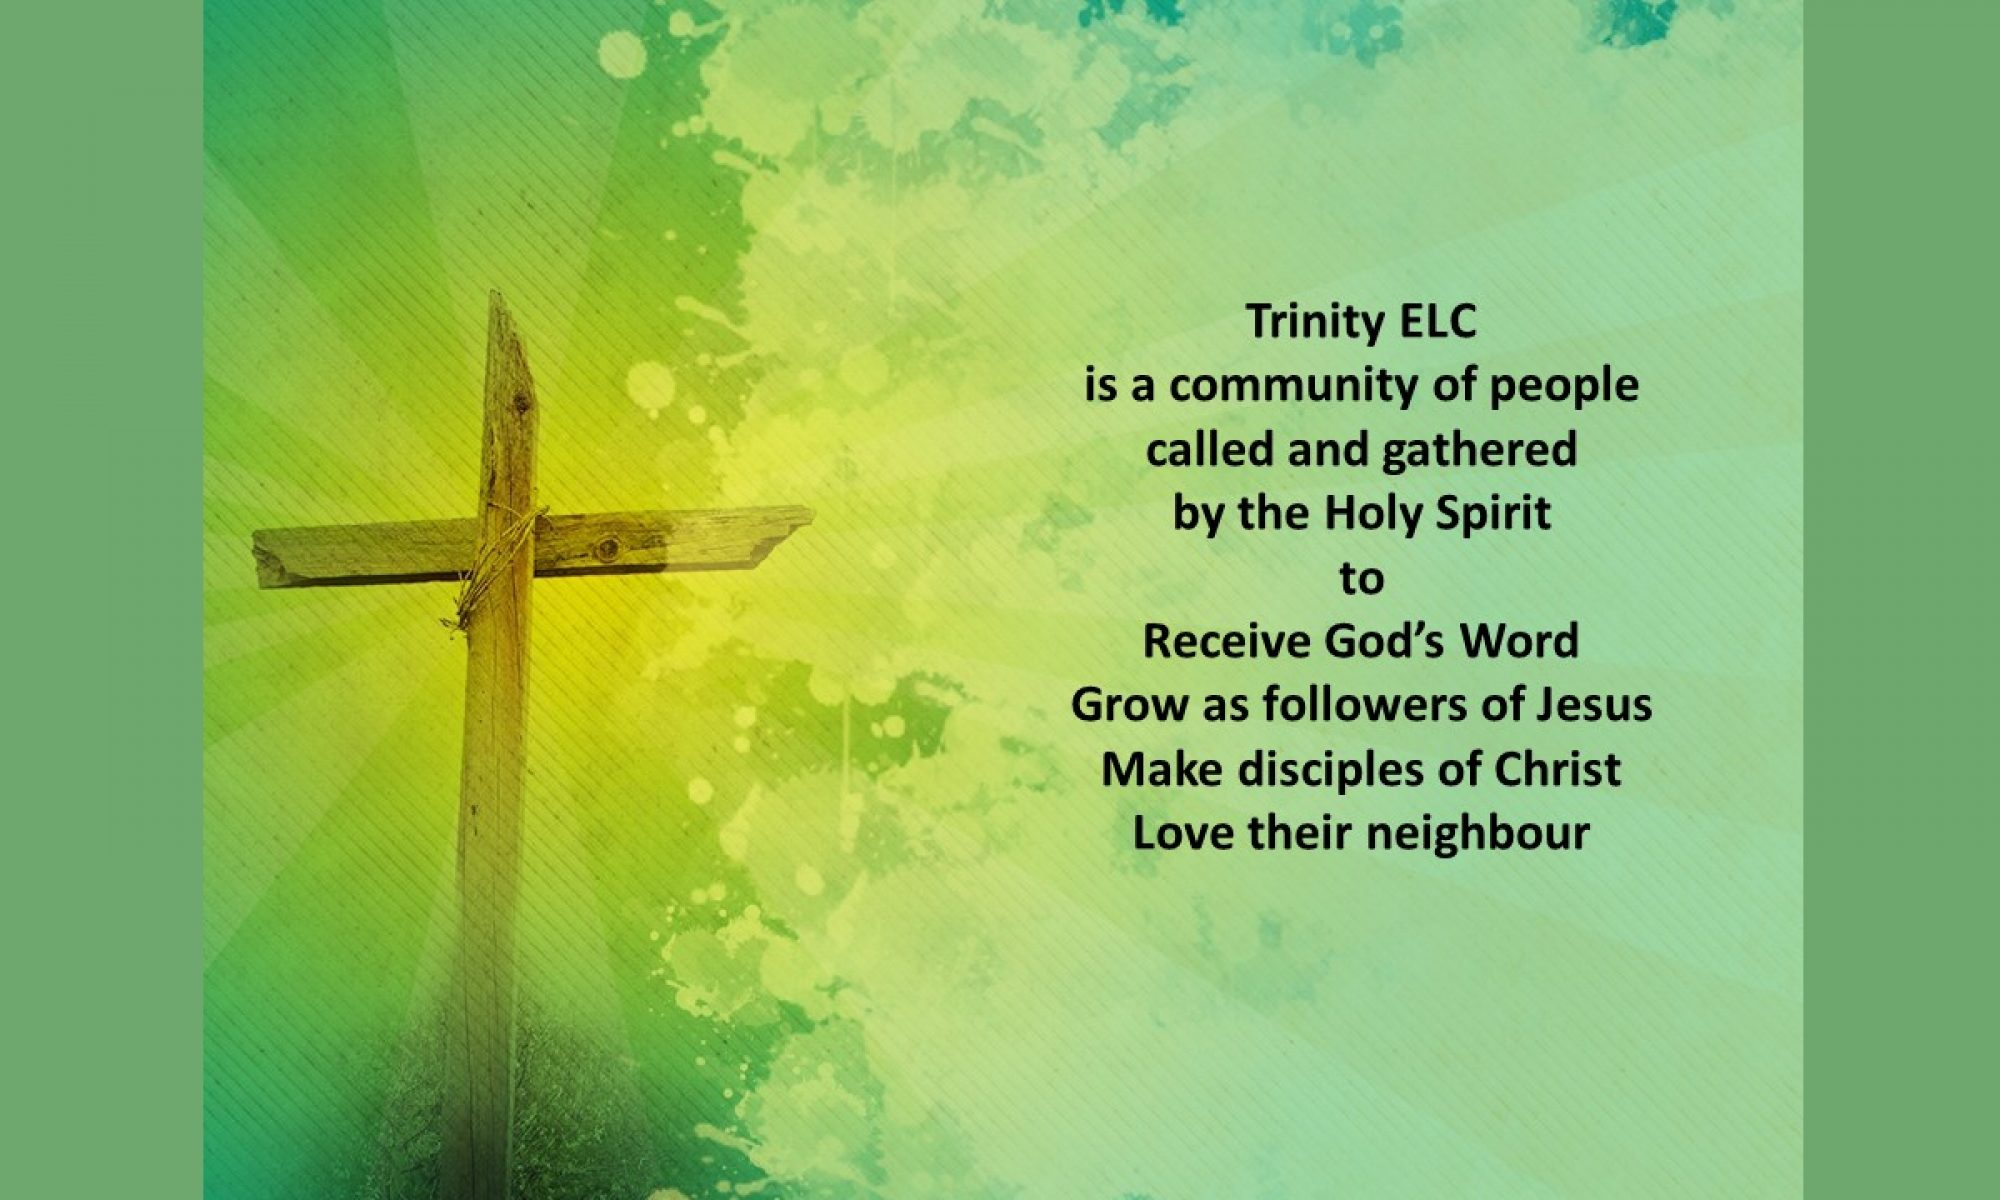 Trinity ELC